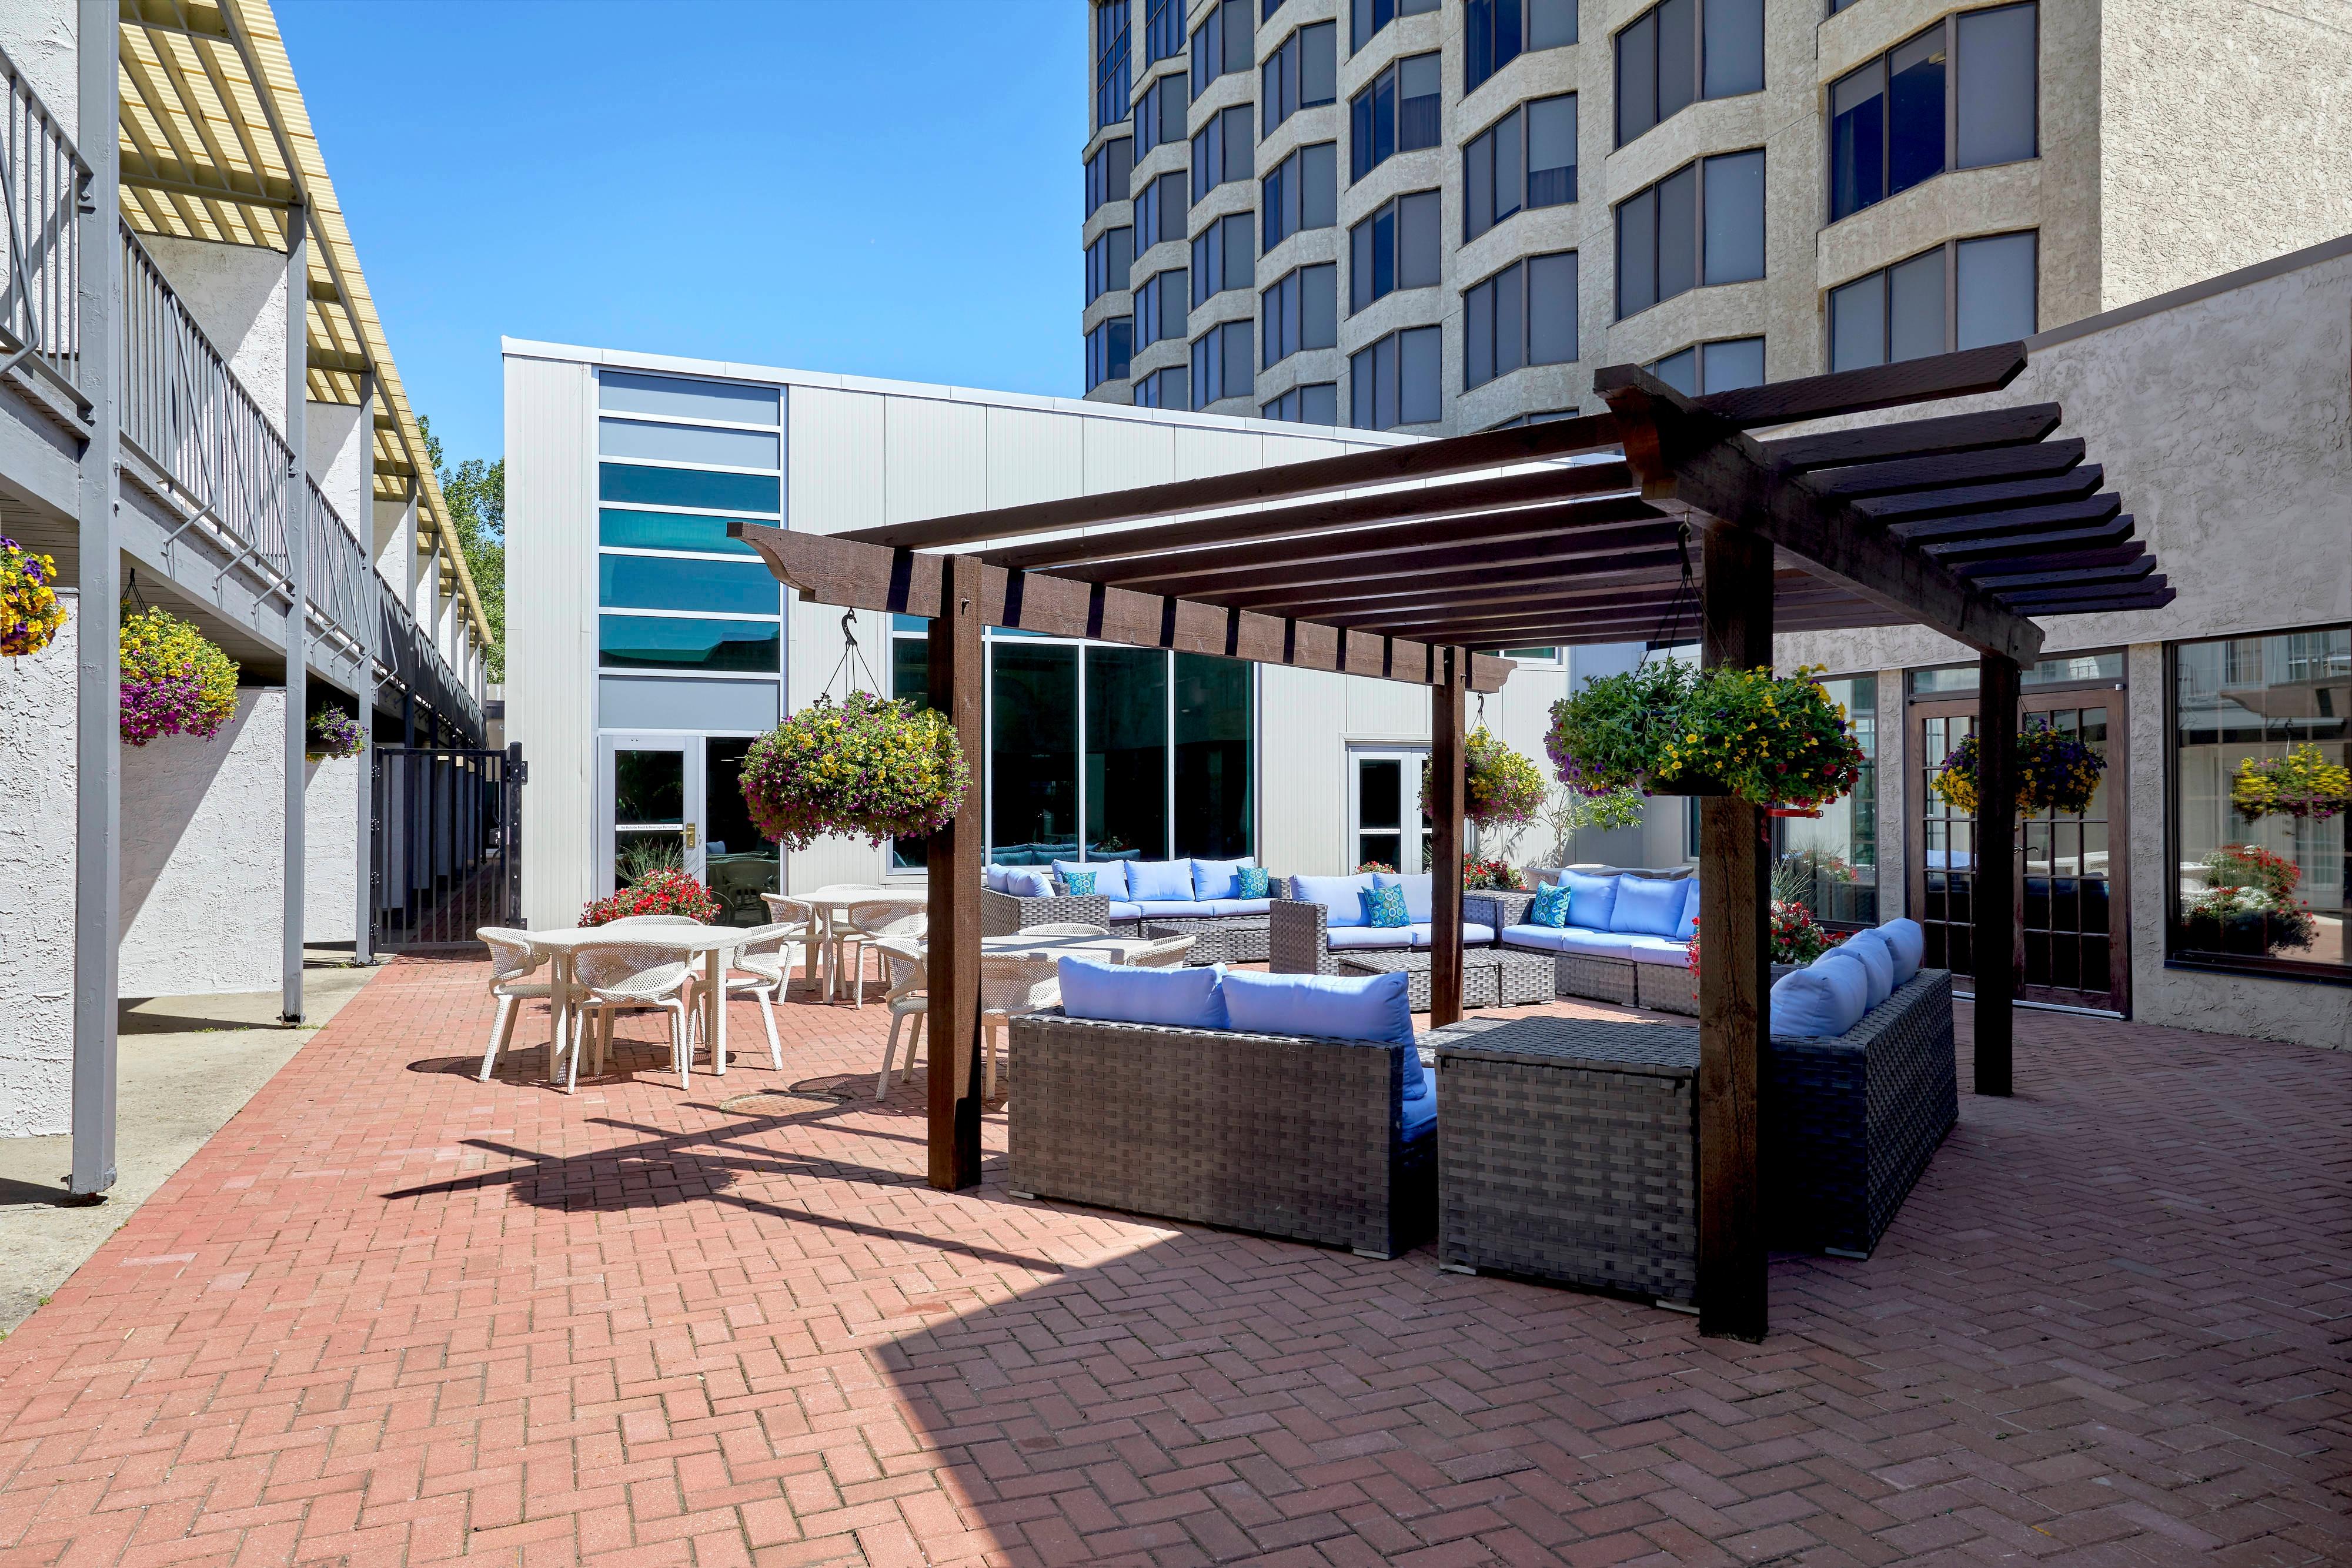 Garden Terrace Lounge Patio